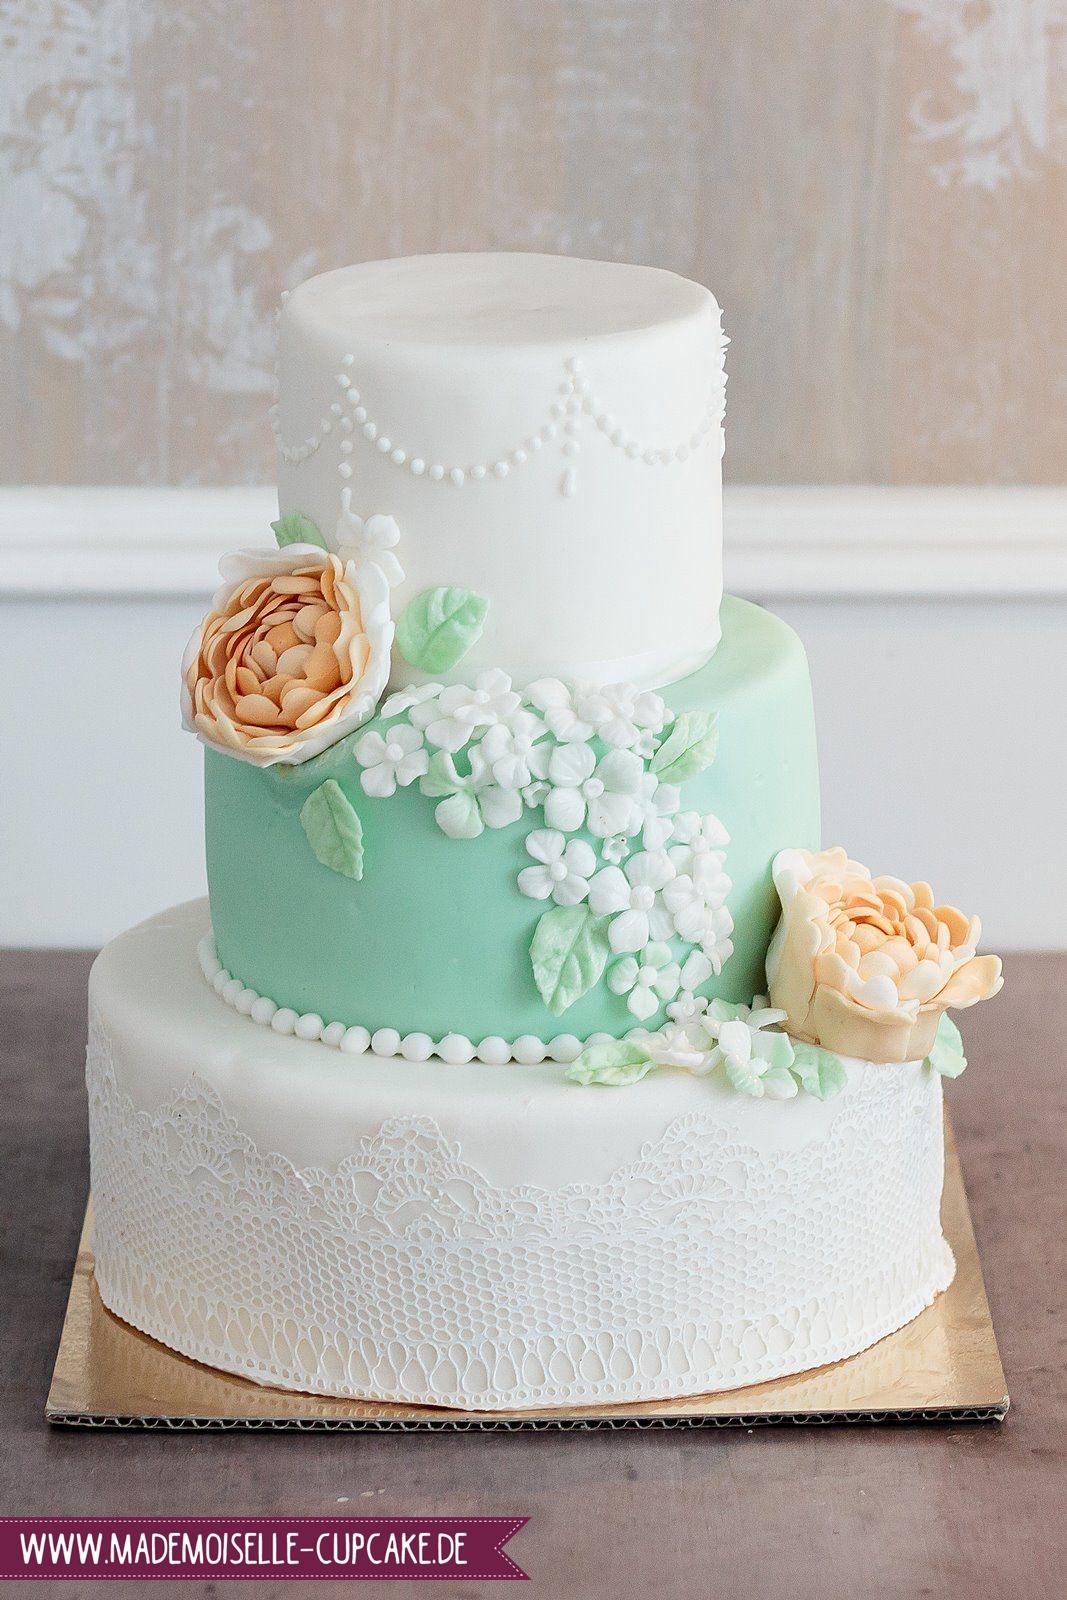 Mint Liebt Apricot Mademoiselle Cupcake